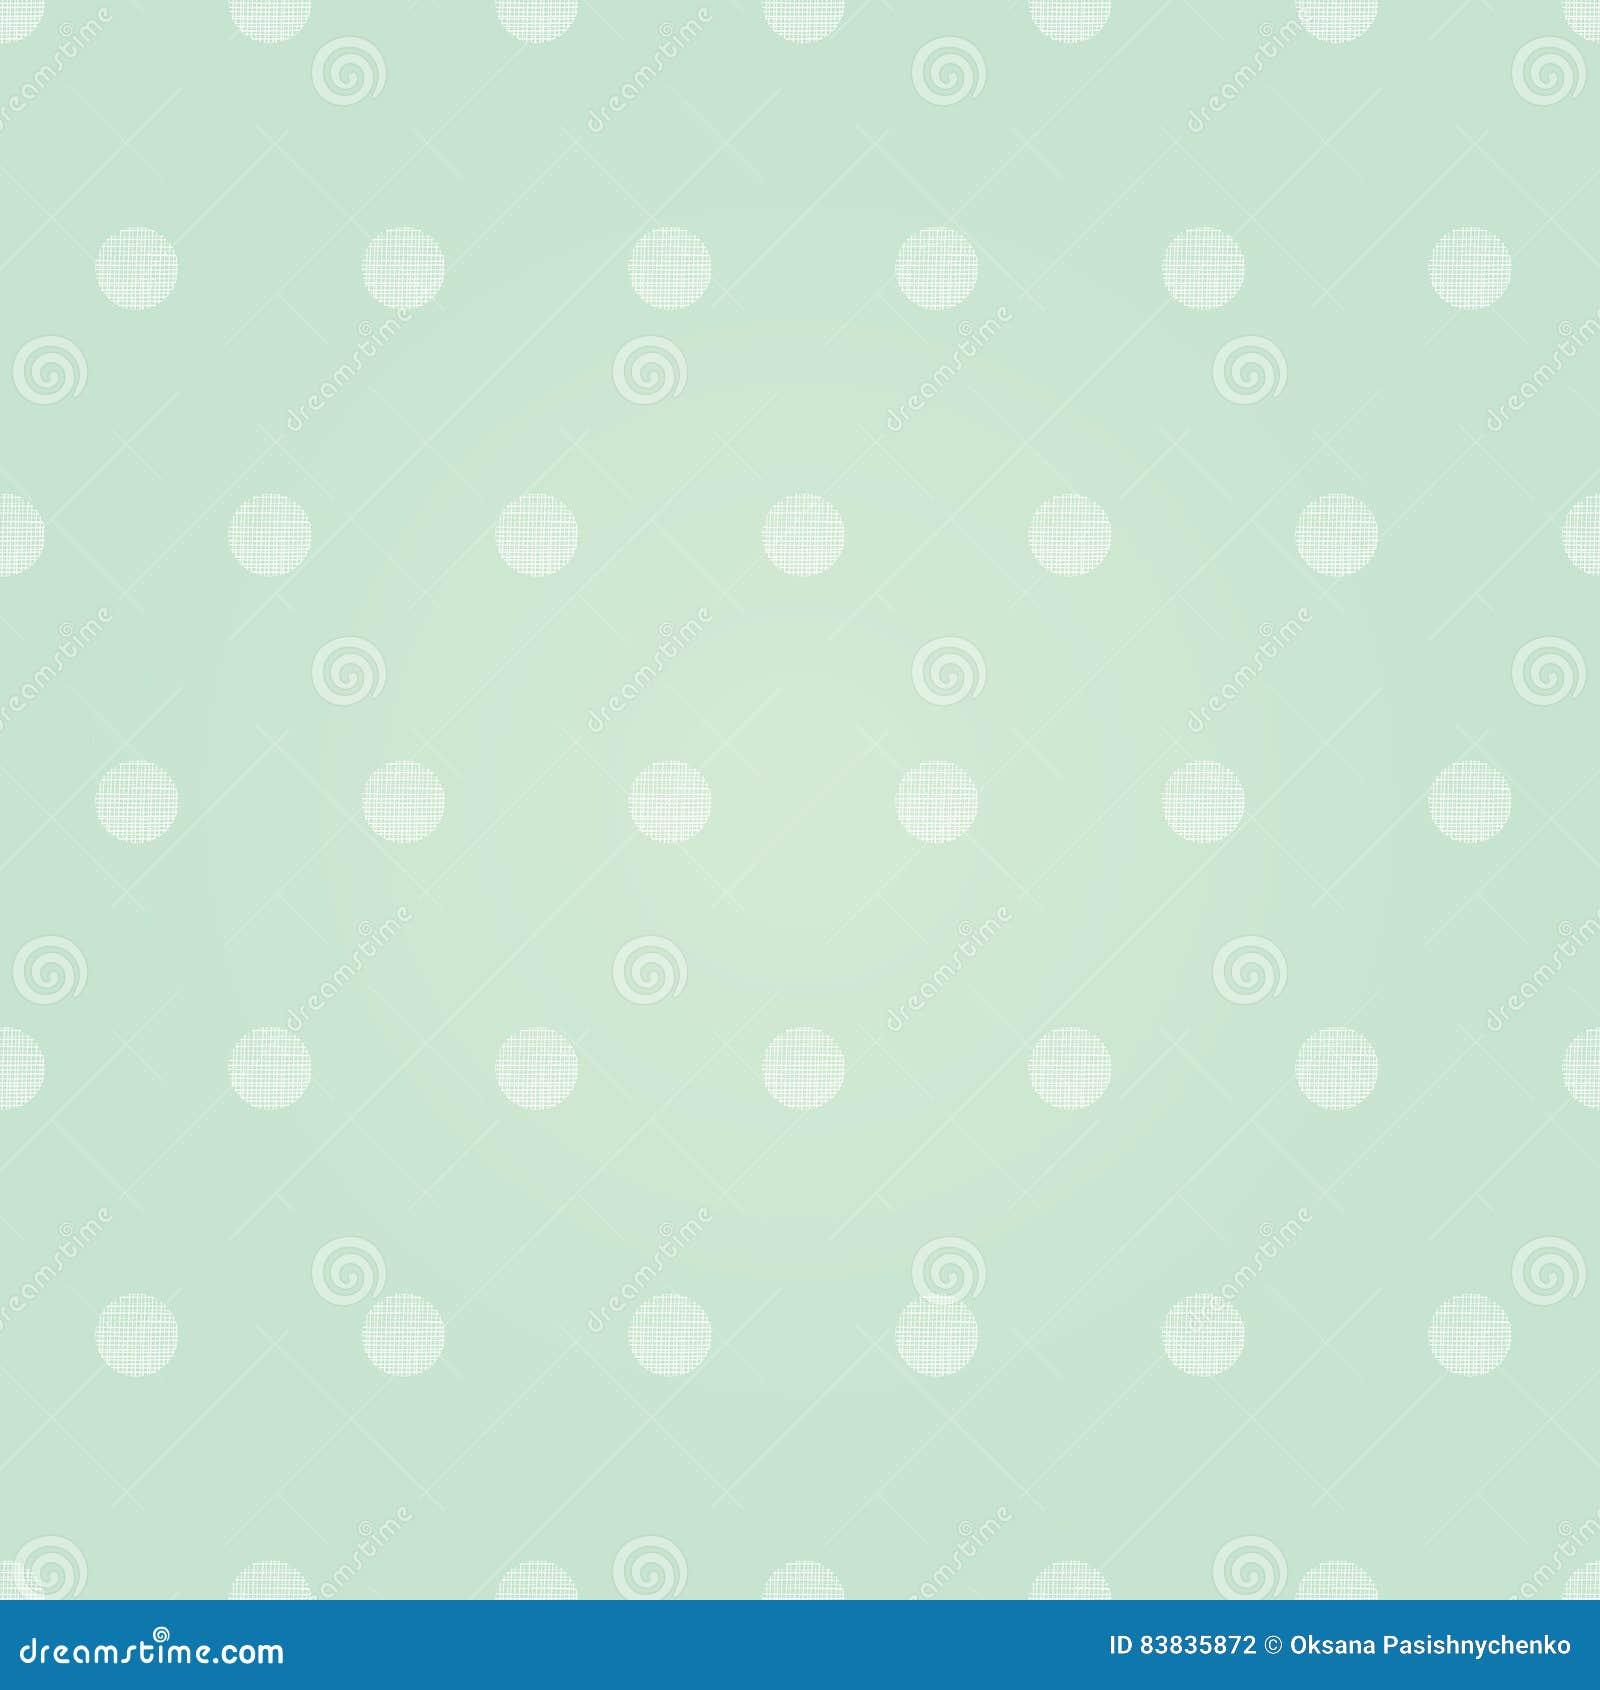 Blush Nursery With Neutral Textures: Vector Vintage Mint Green Polka Dots Circles Seamless